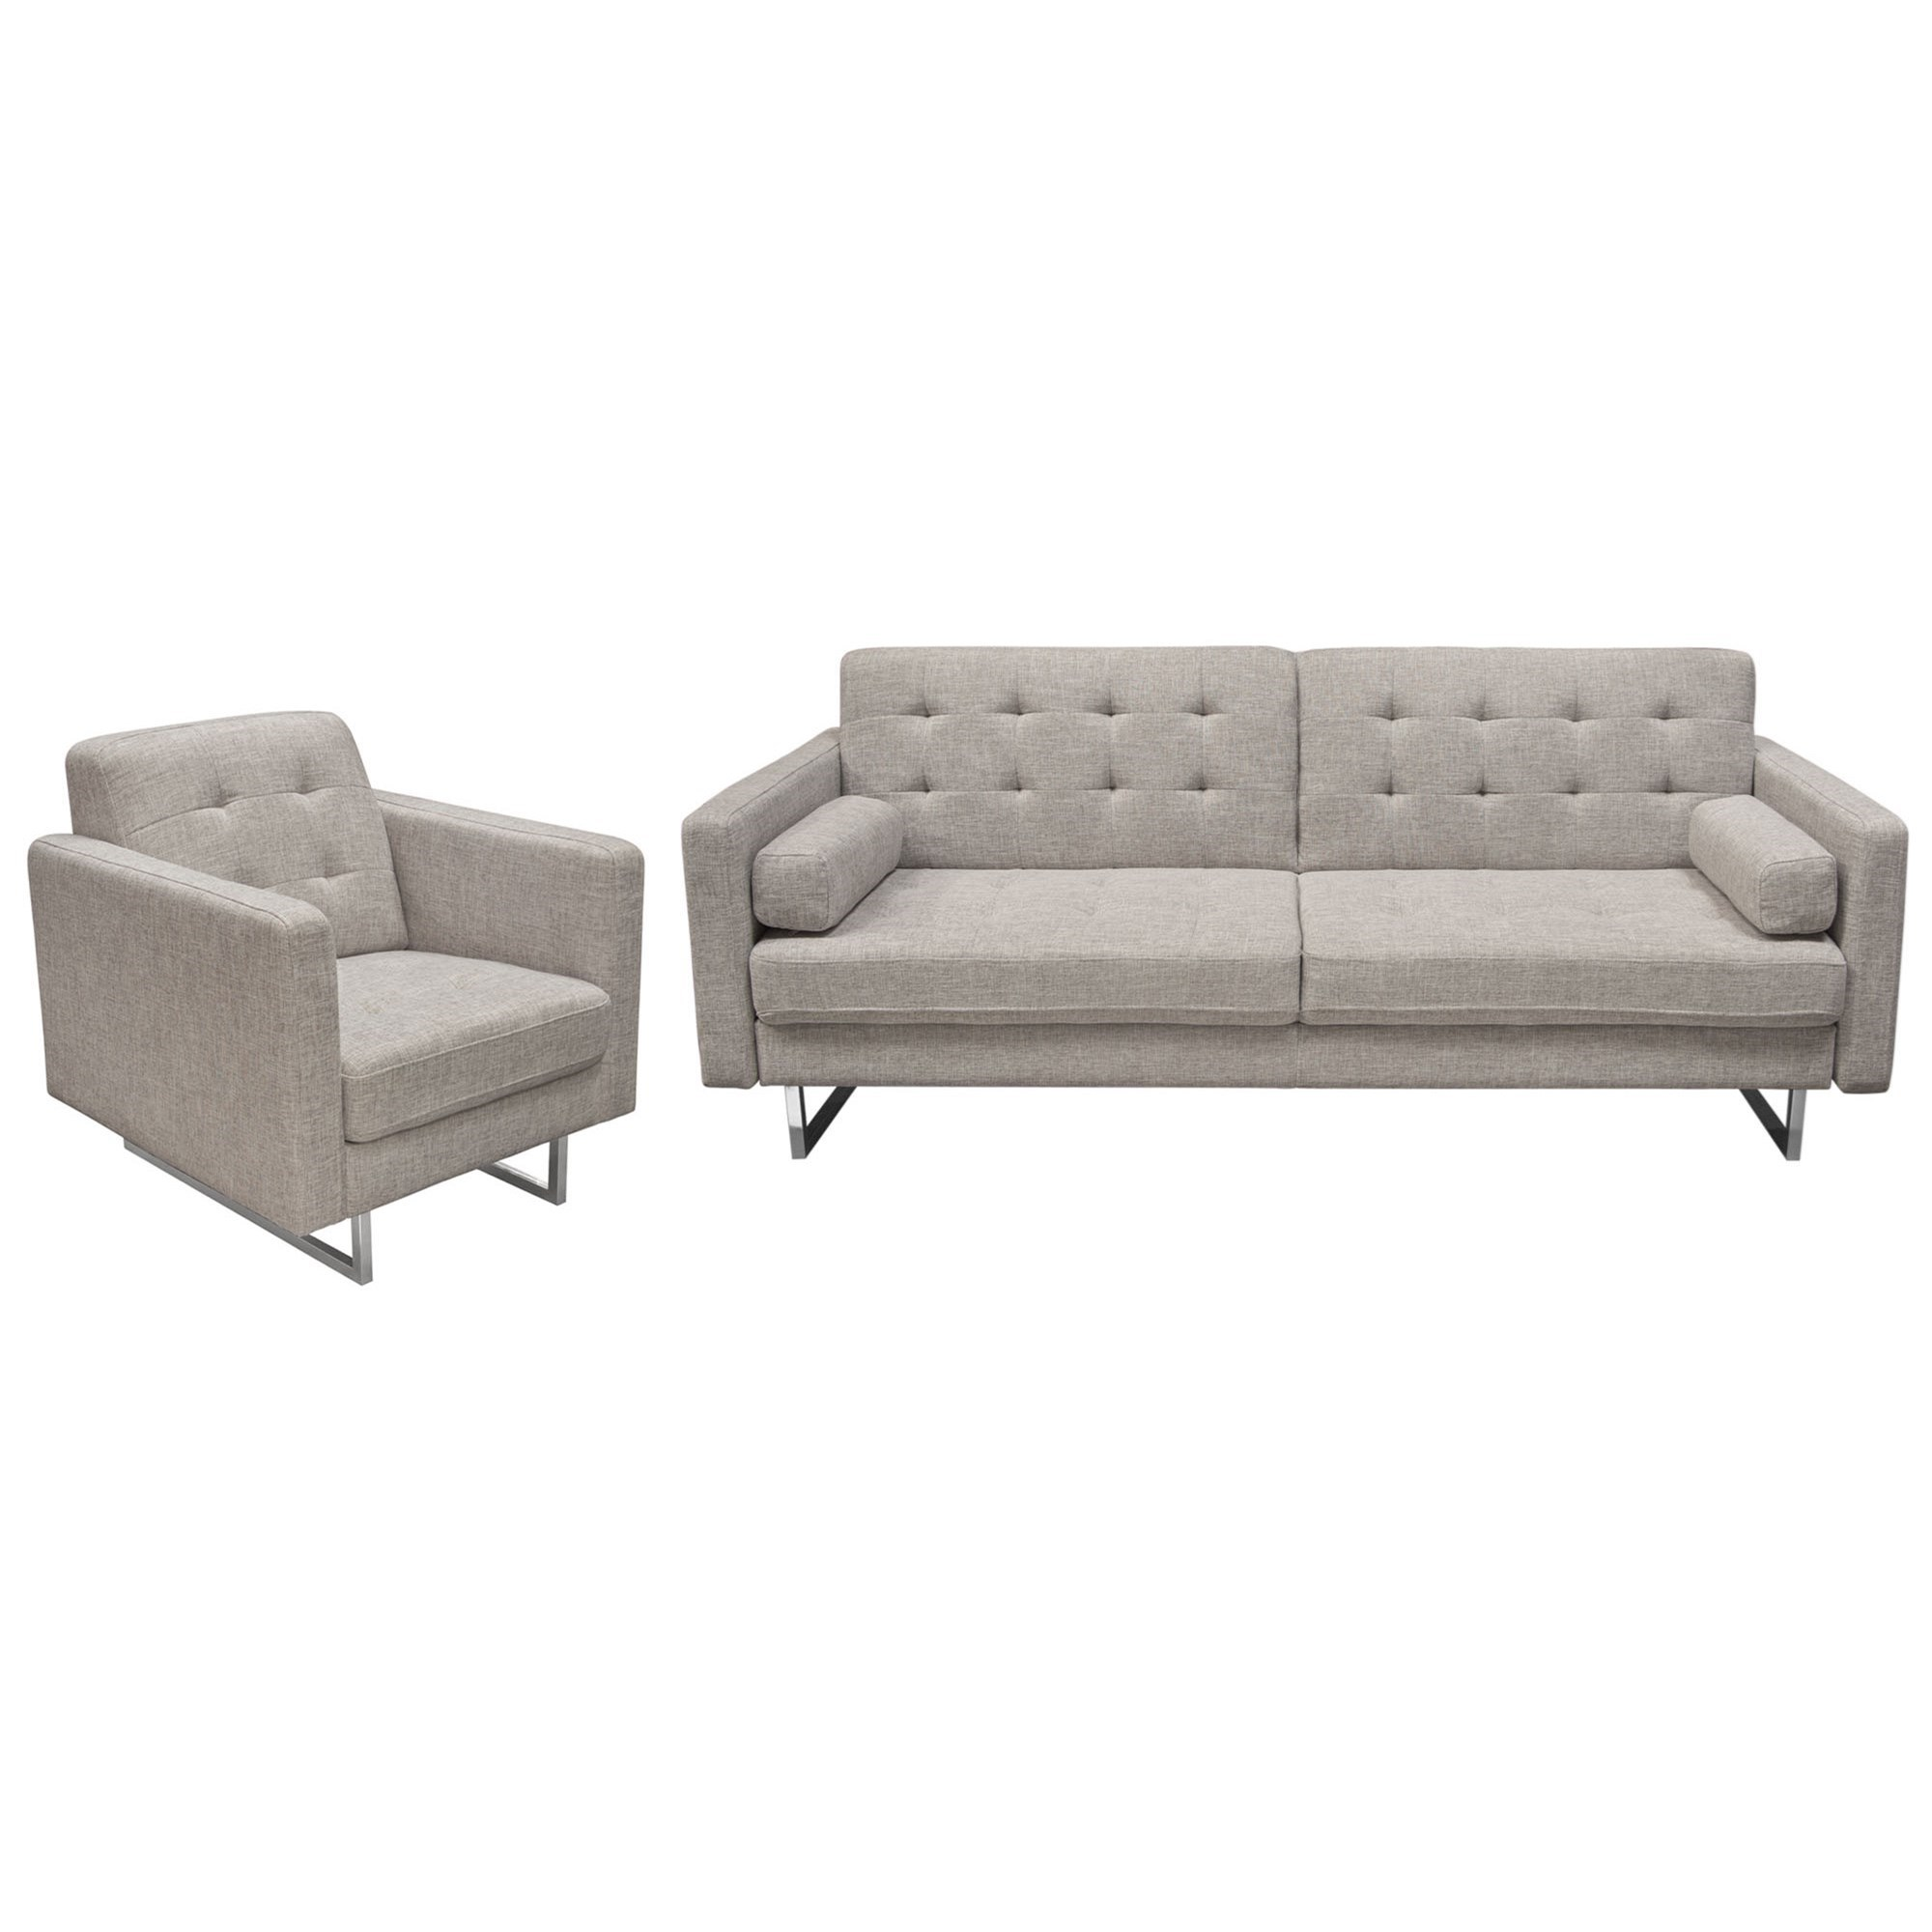 Opus Sofa and Chair Set by Diamond Sofa at HomeWorld Furniture